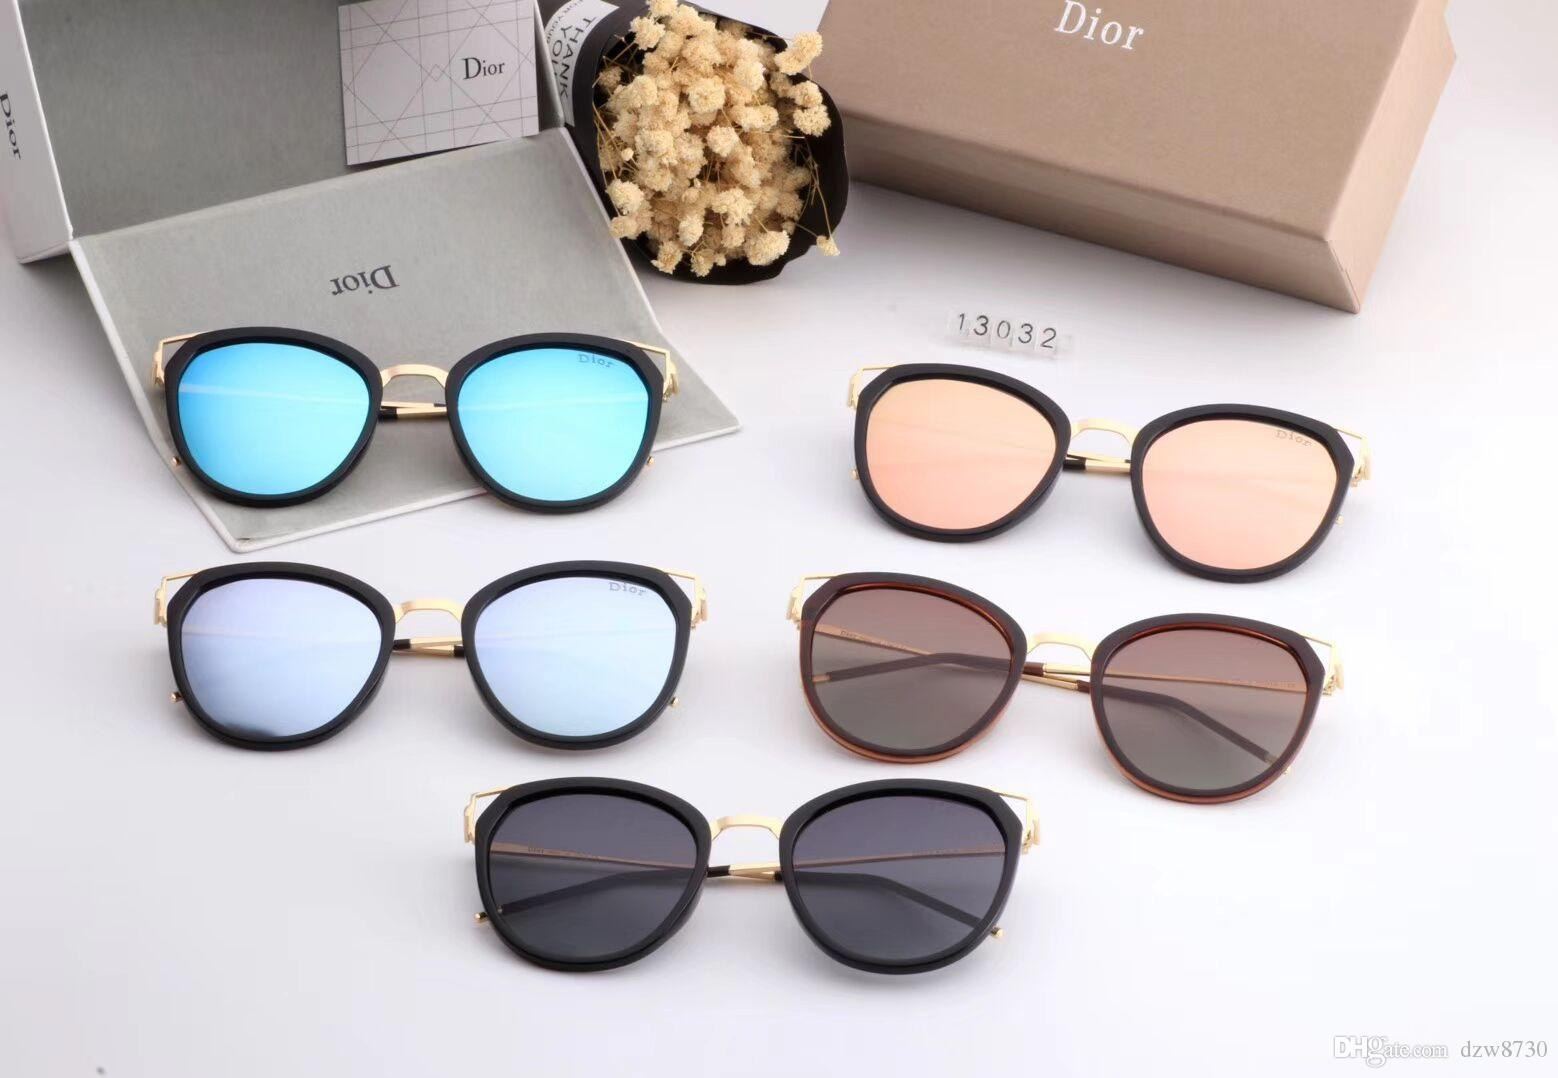 c04a6a11a1 New designer sunglasses 2238 sunglasses for women men sun glasses women  brand designer coating UV protection Pearl rivets fashion sunglasses